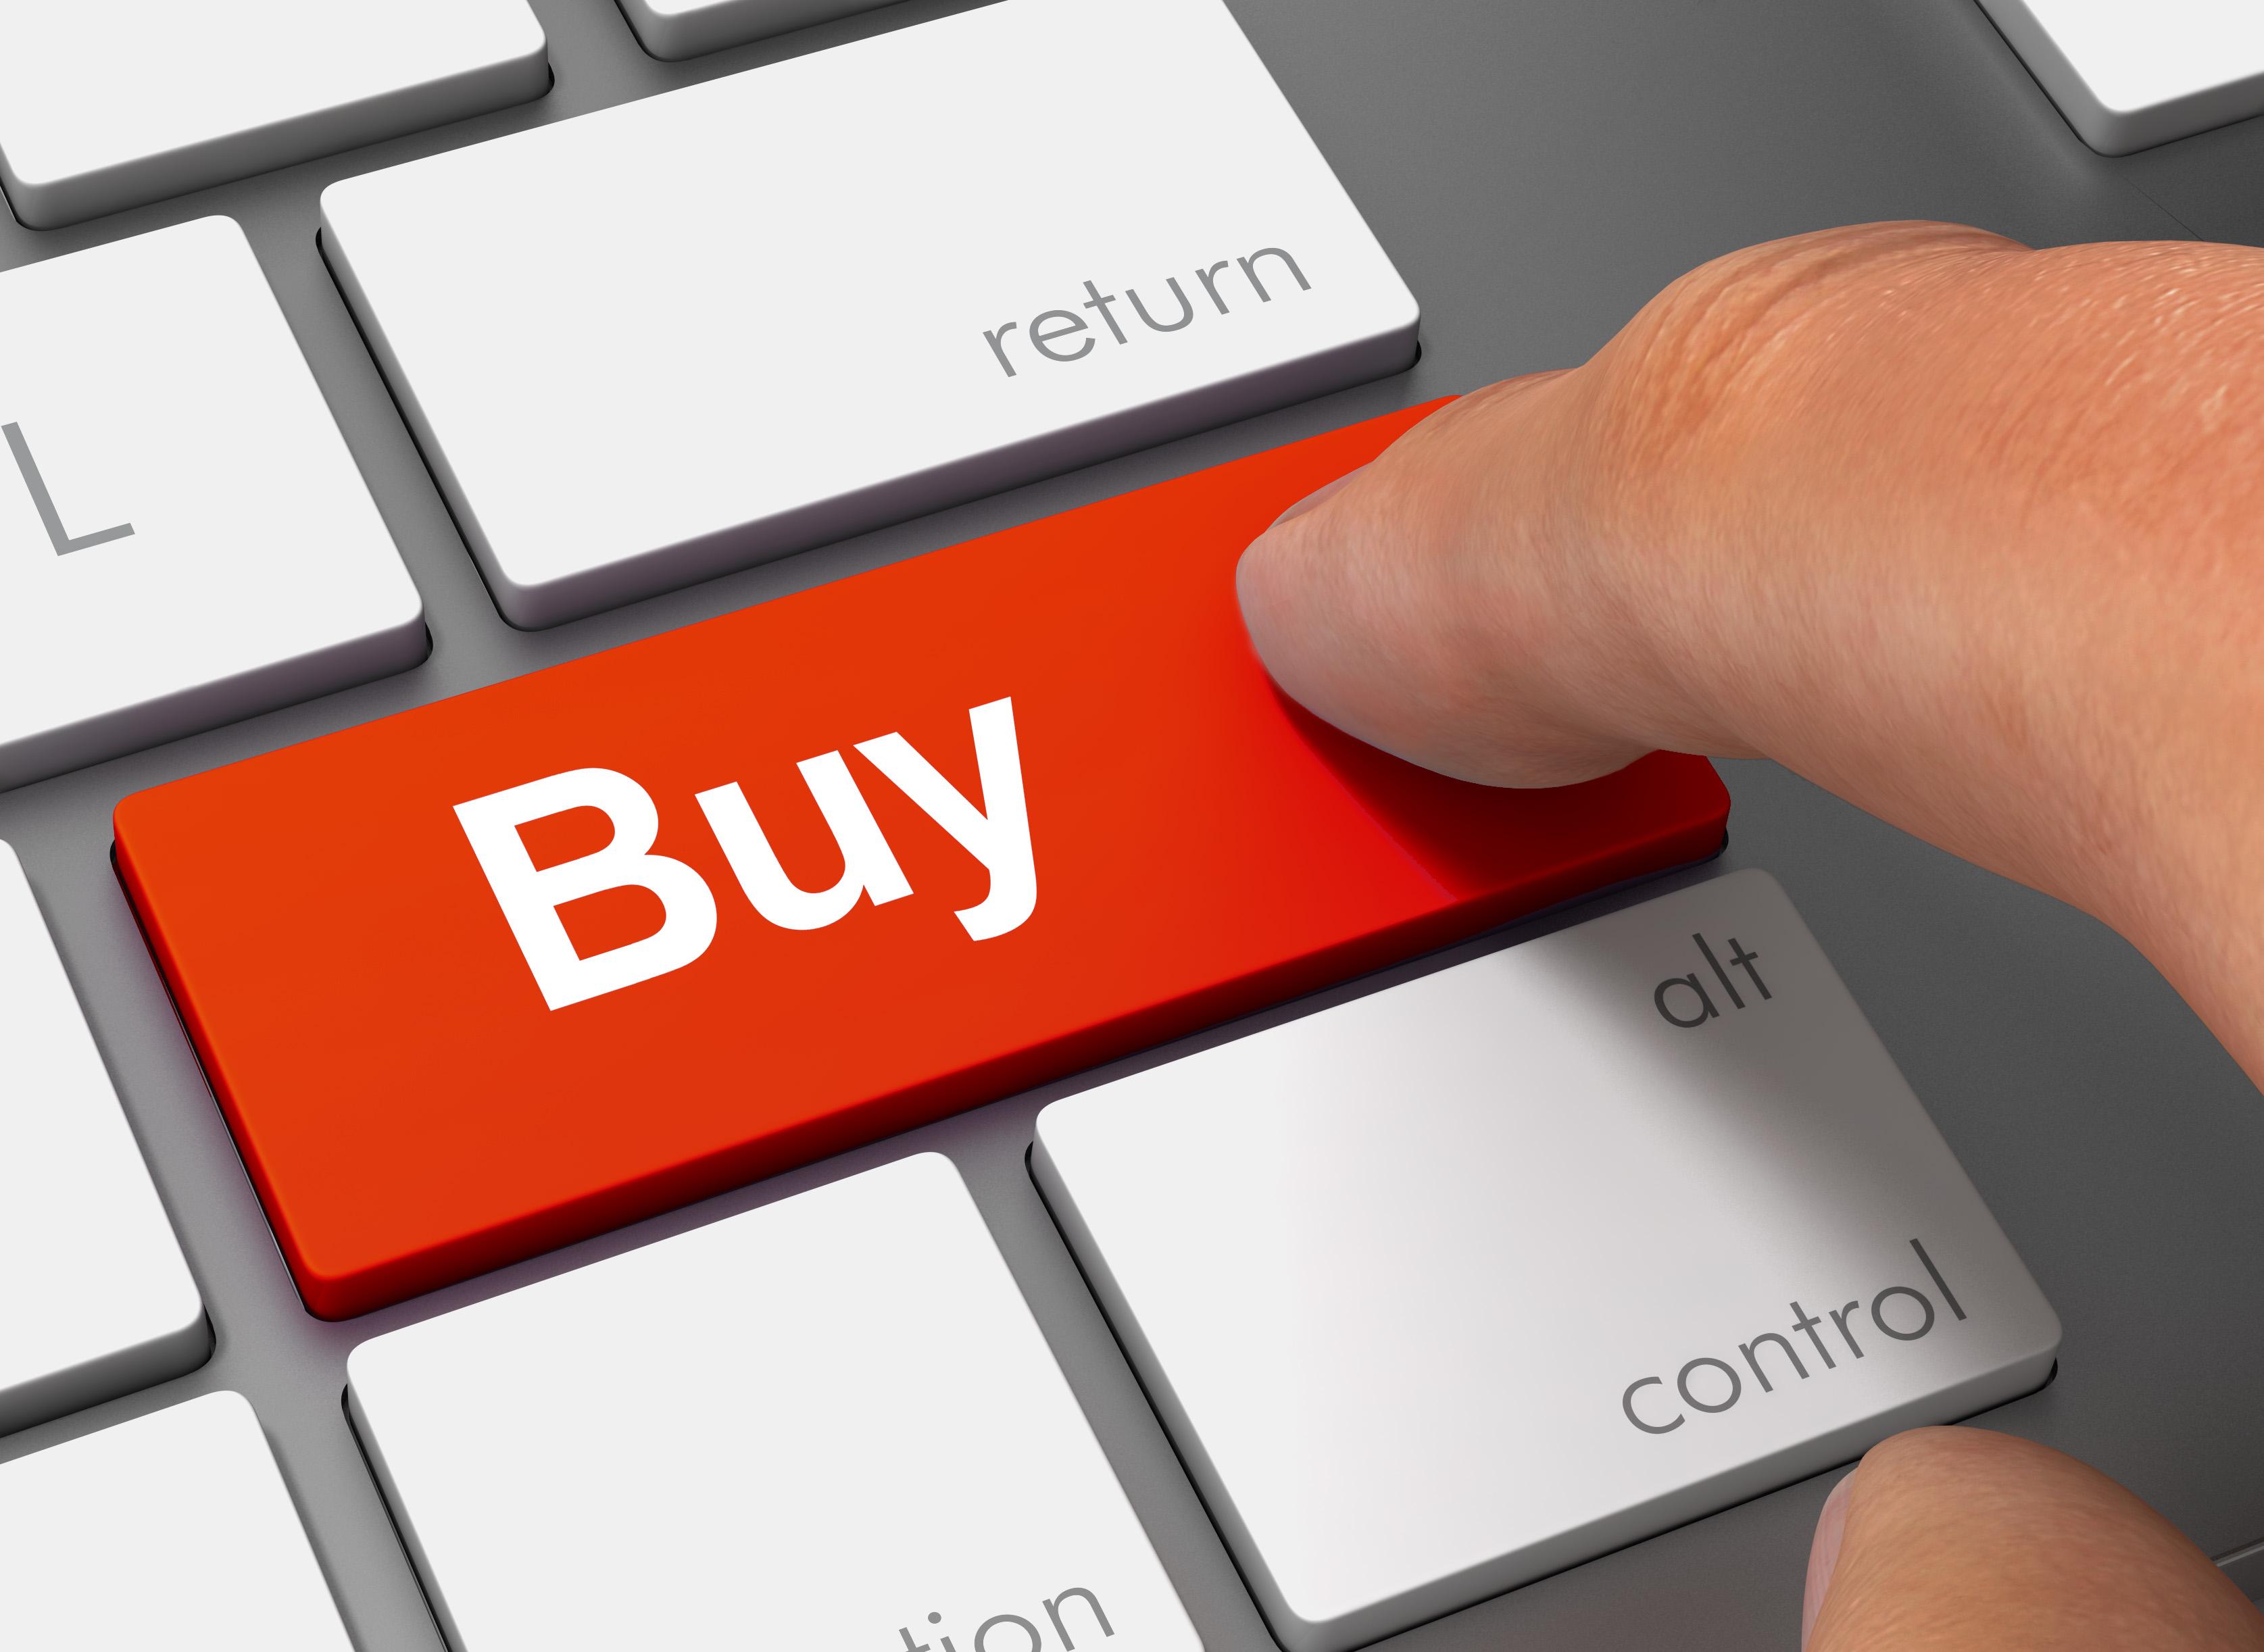 2 Top Stocks to Buy in This Coronavirus-Rattled Stock Market | The Motley Fool